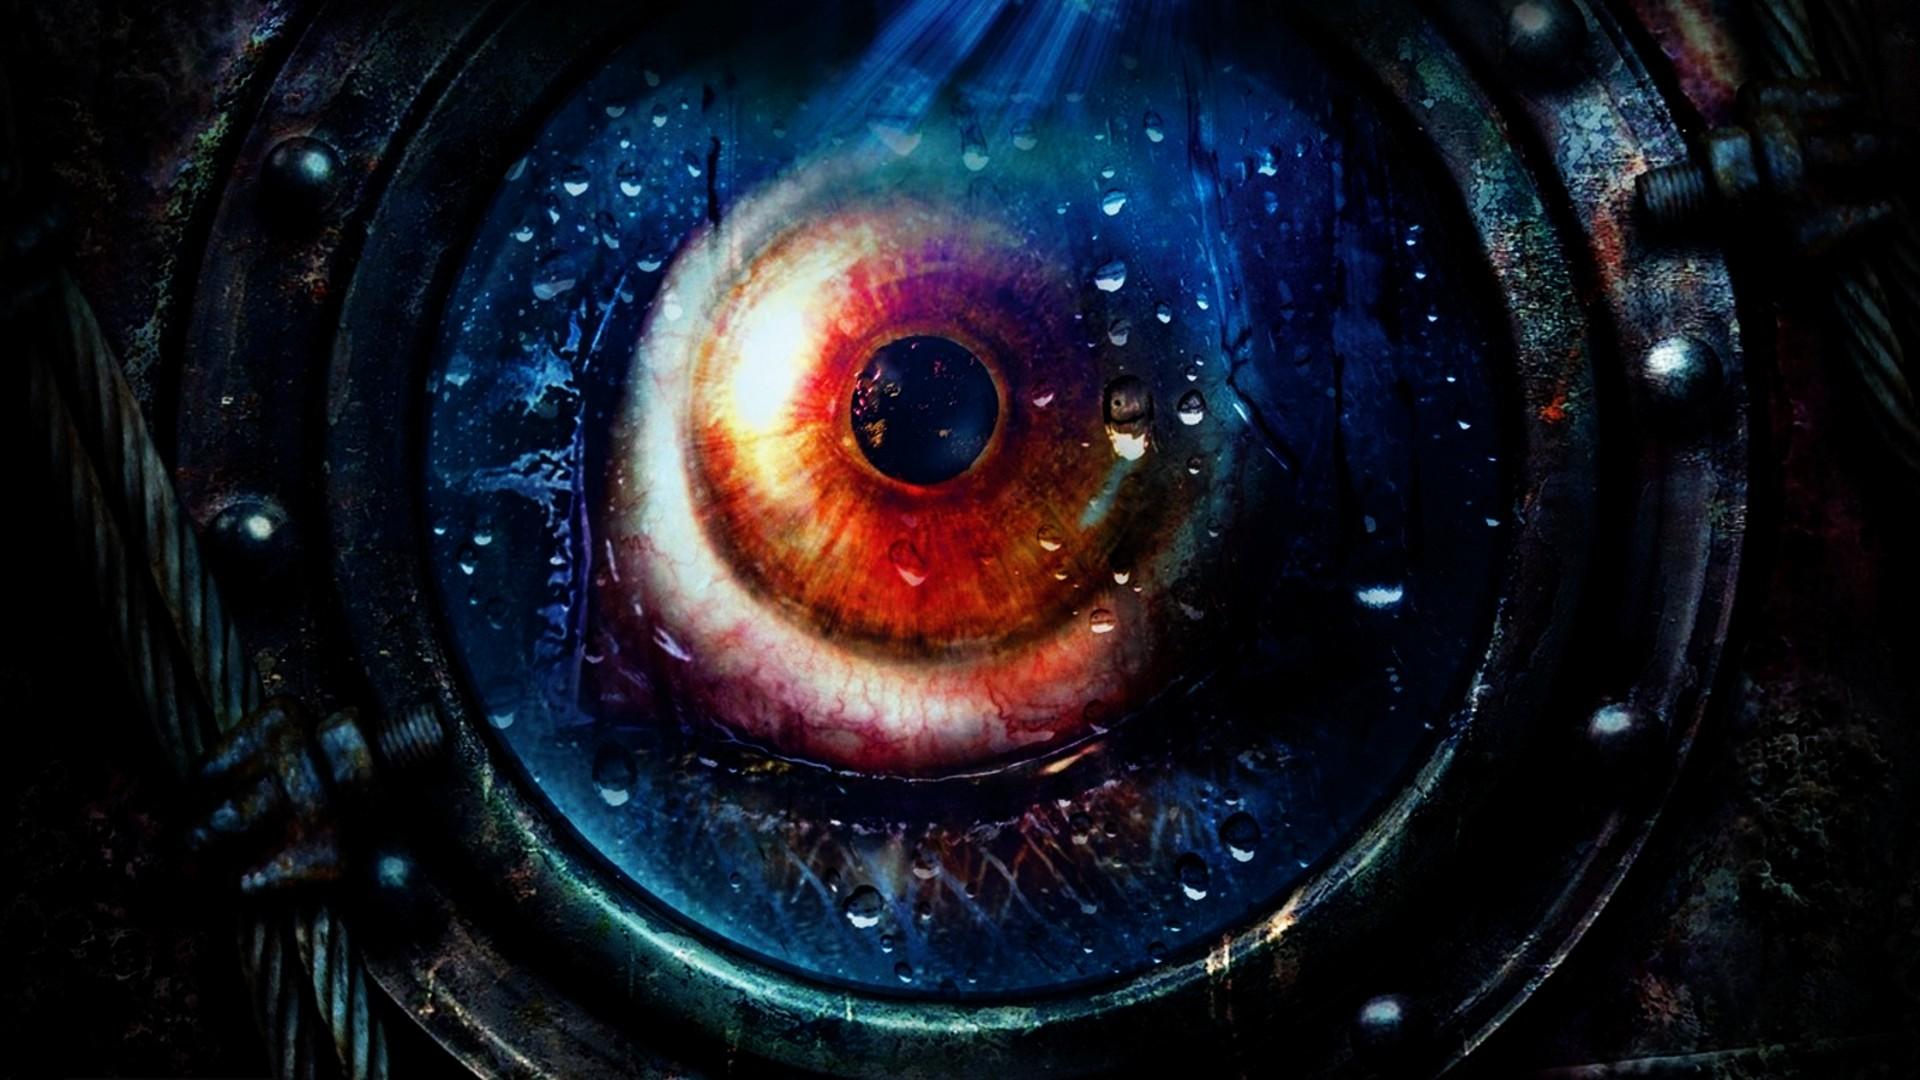 horror eye wallpaper hd - photo #15